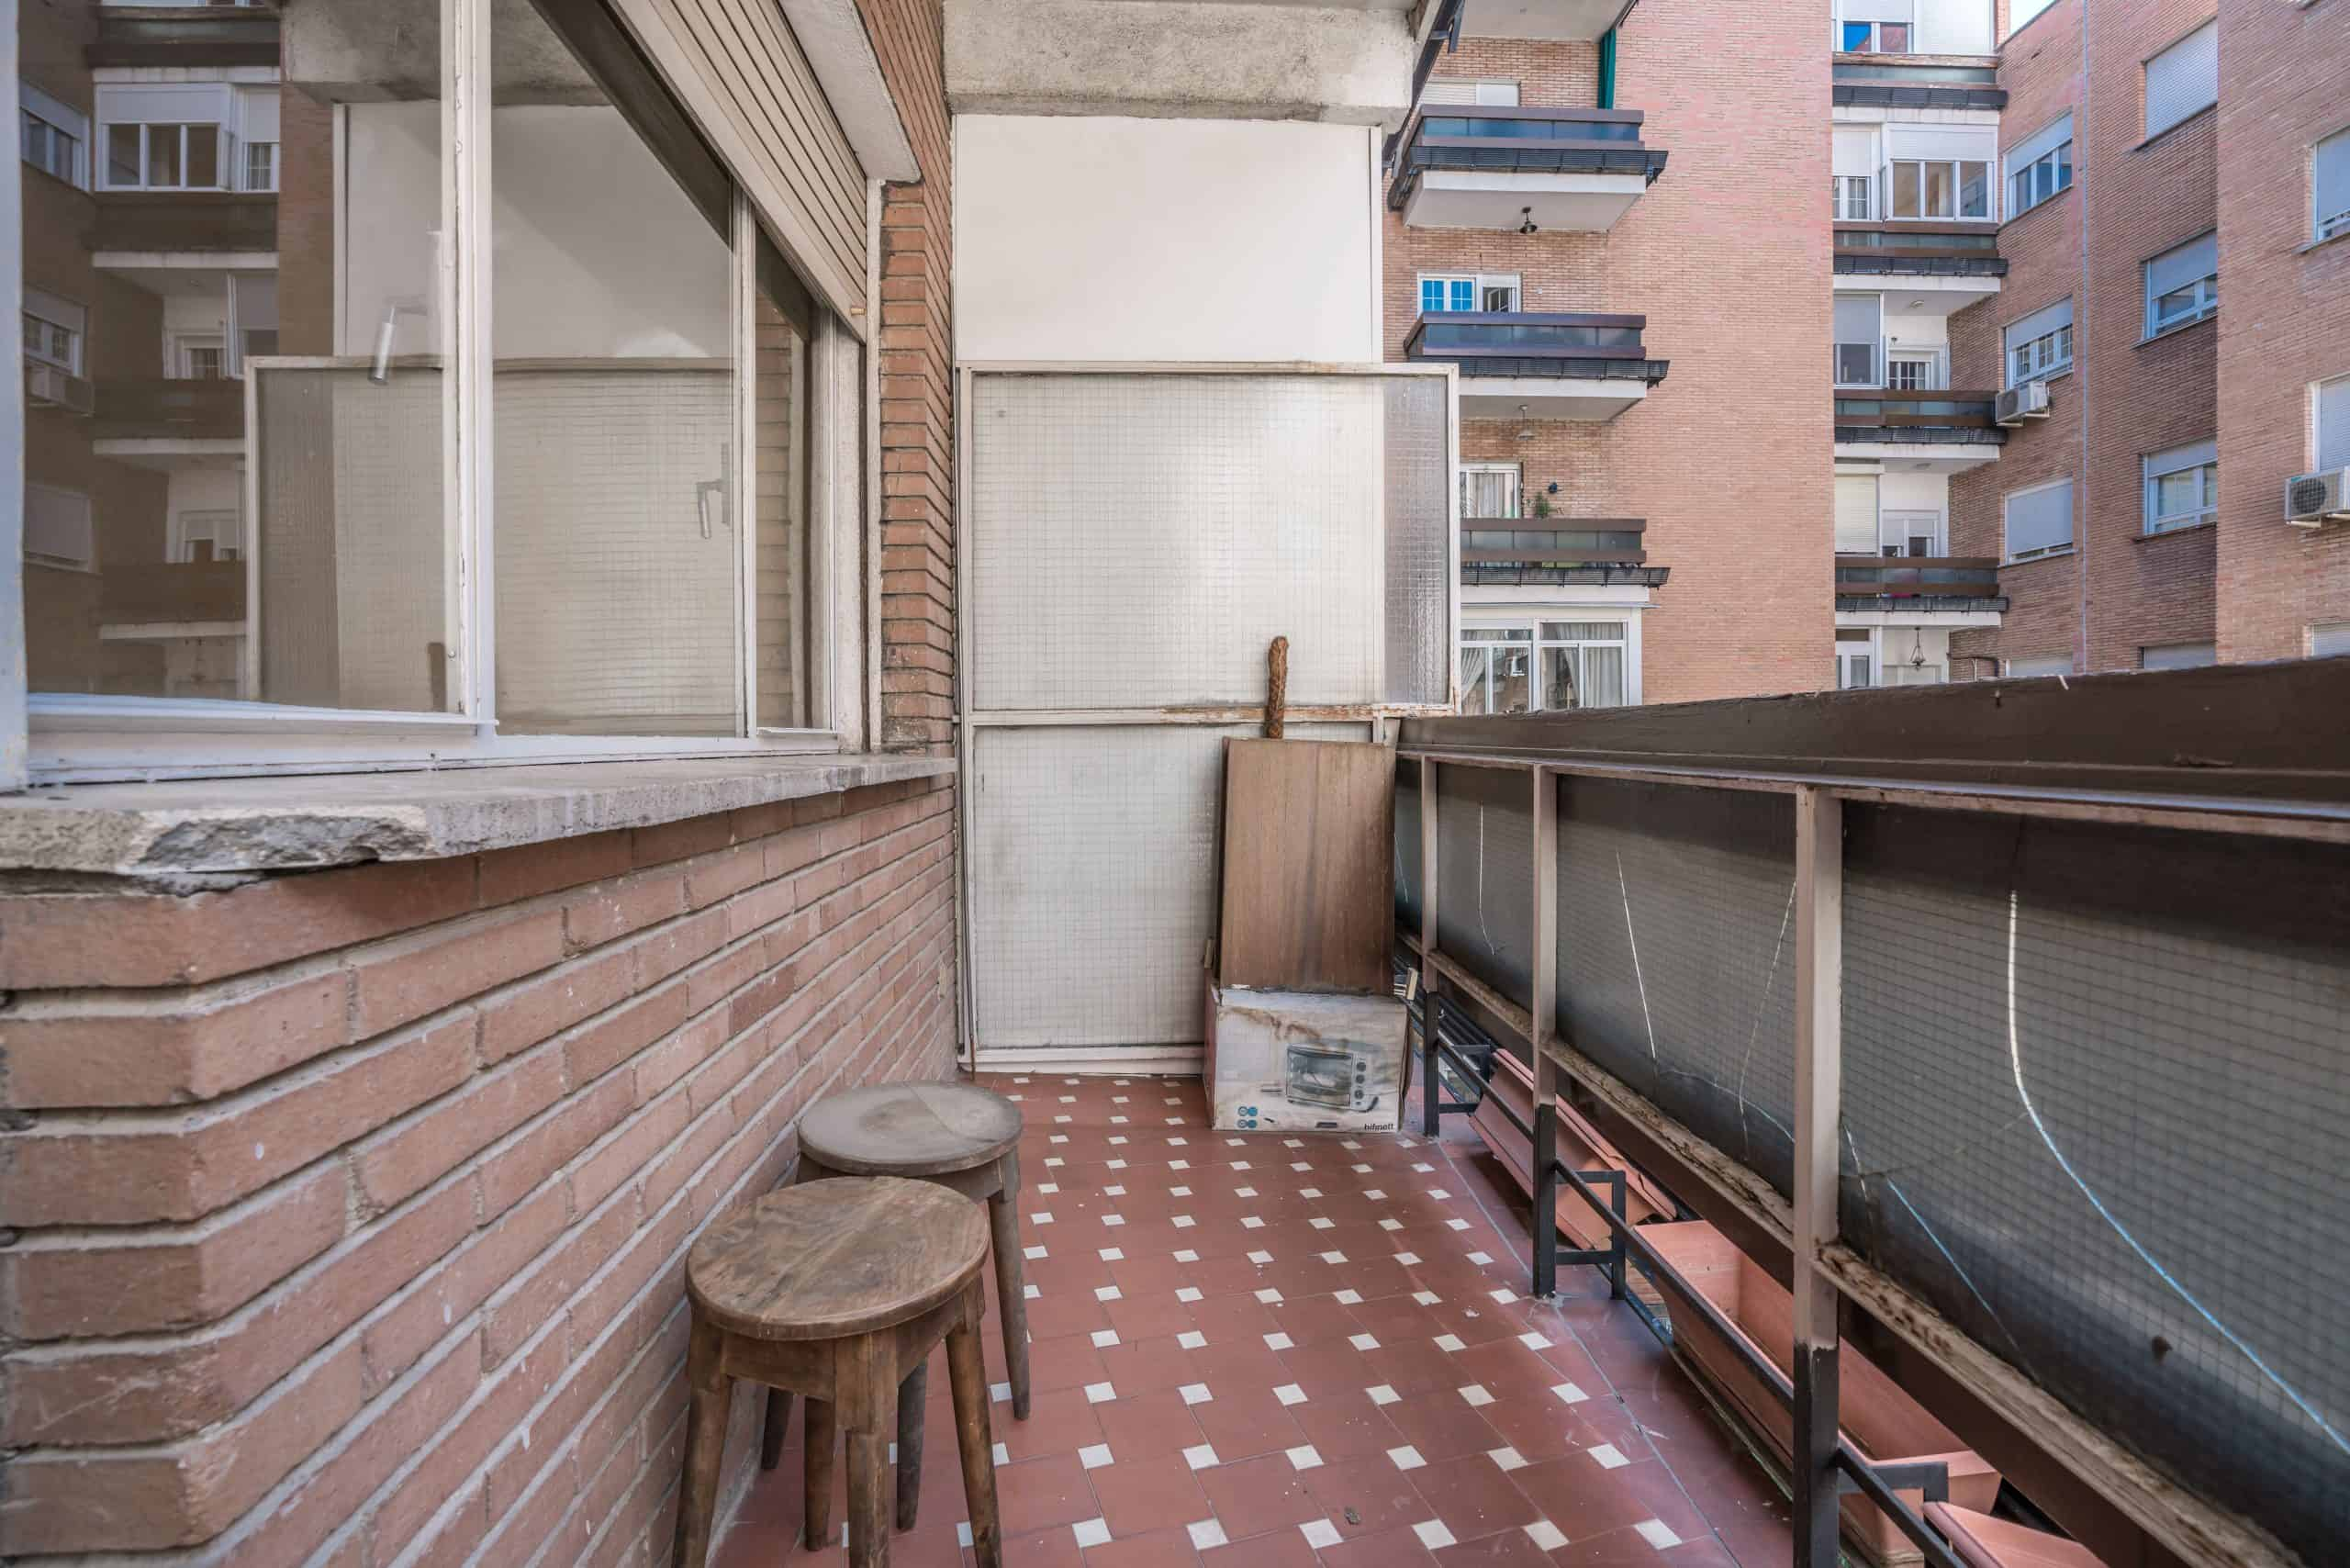 Agencia Inmobiliaria de Madrid-FUTUROCASA-Zona ARGANZUELA-EMBAJADORES-LEGAZPI -calle EMBAJADORES 108-SALON 2-TERRAZA2